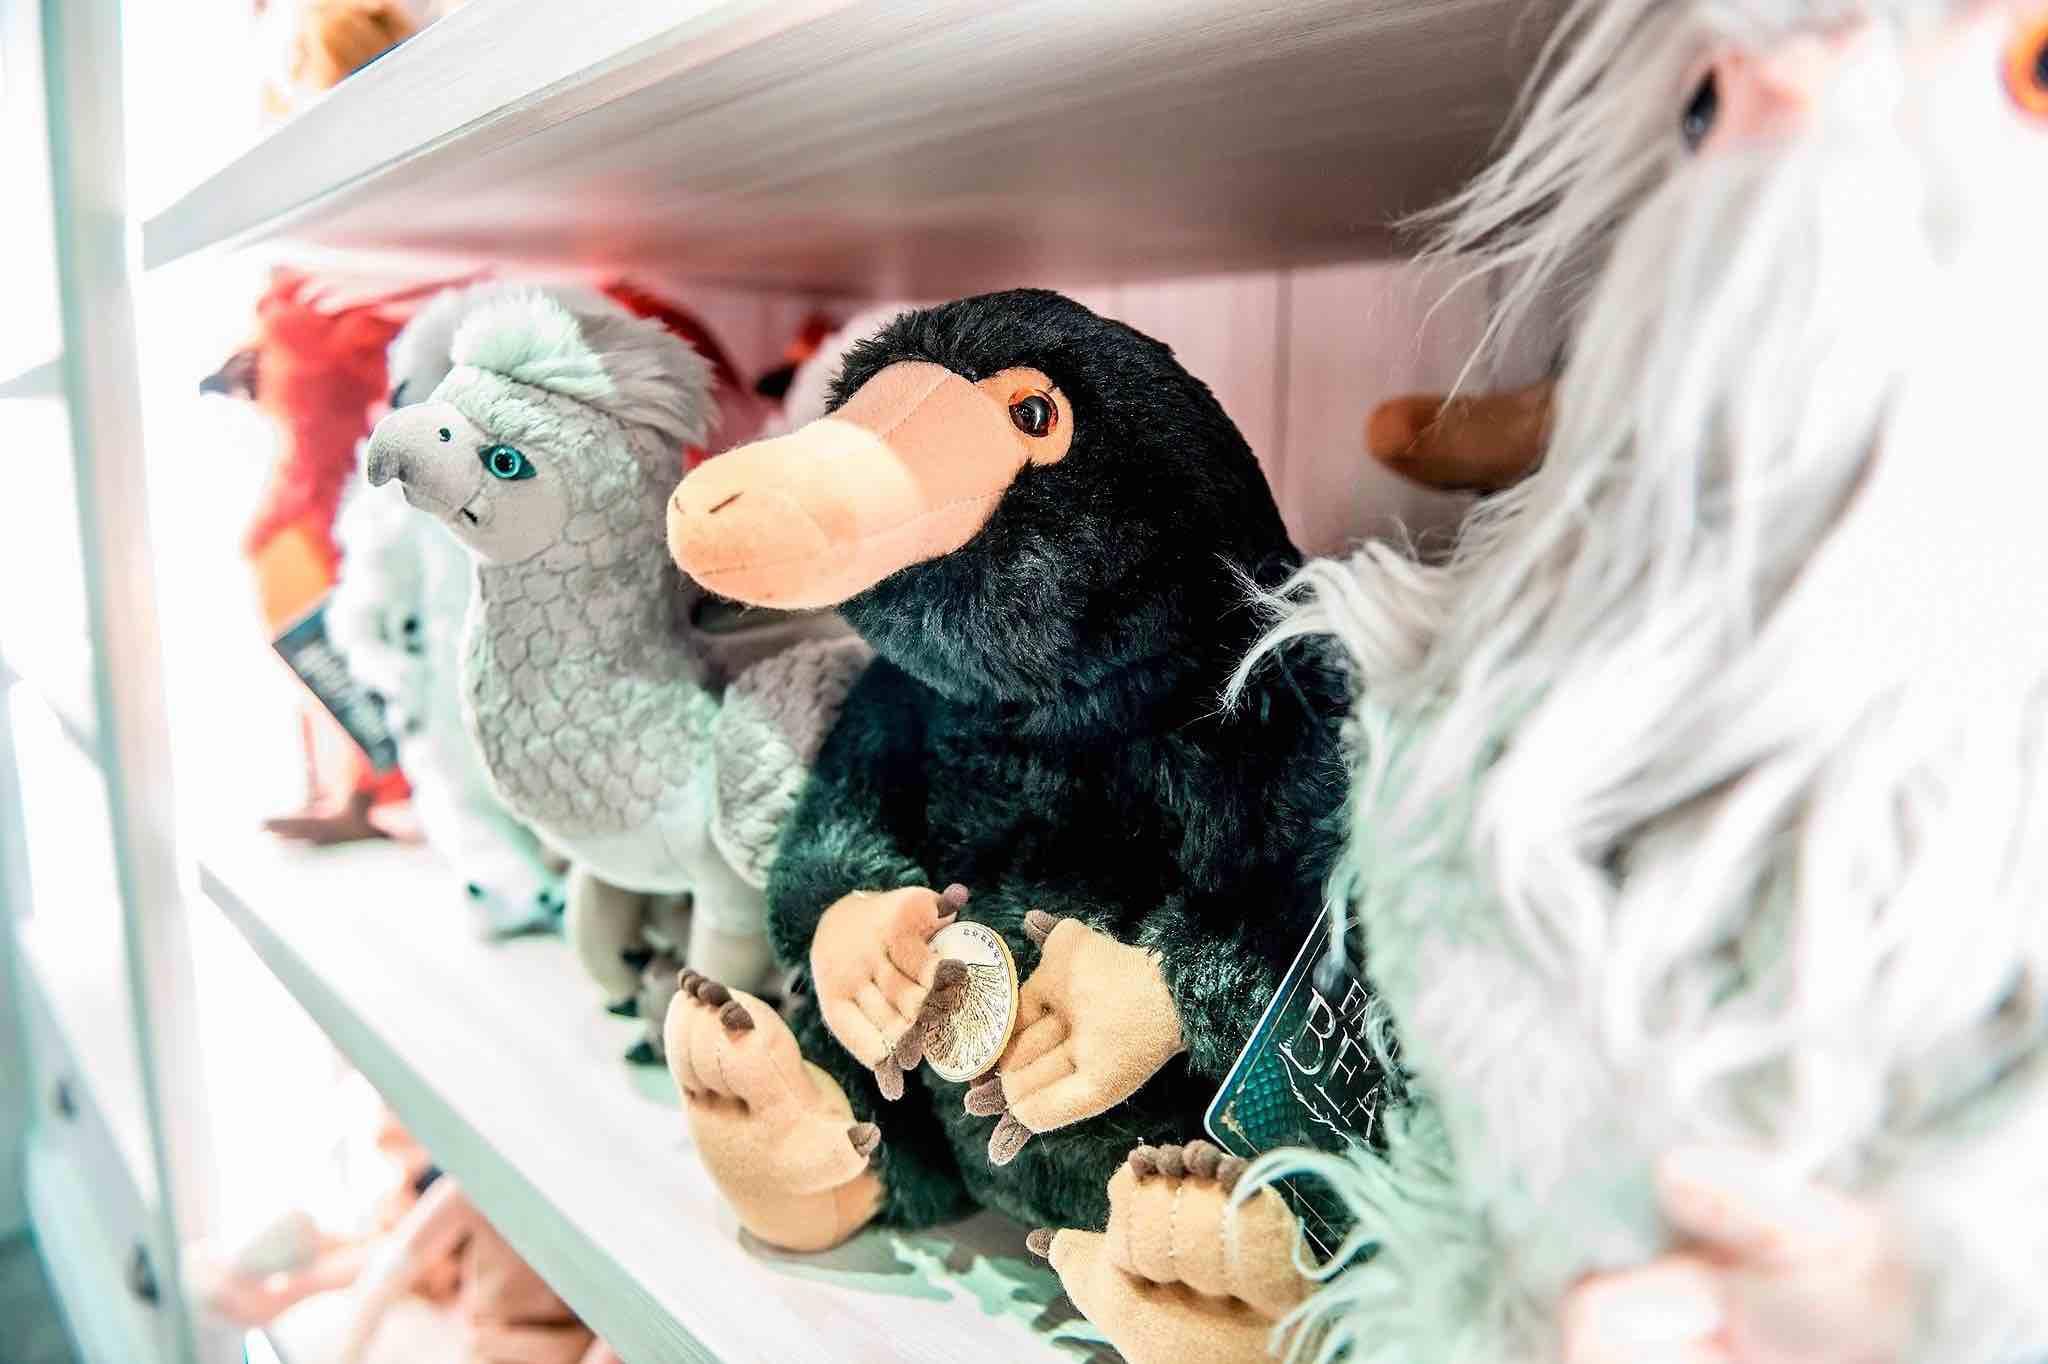 7/Buy Potter paraphernalia at Hamley's Toy Store